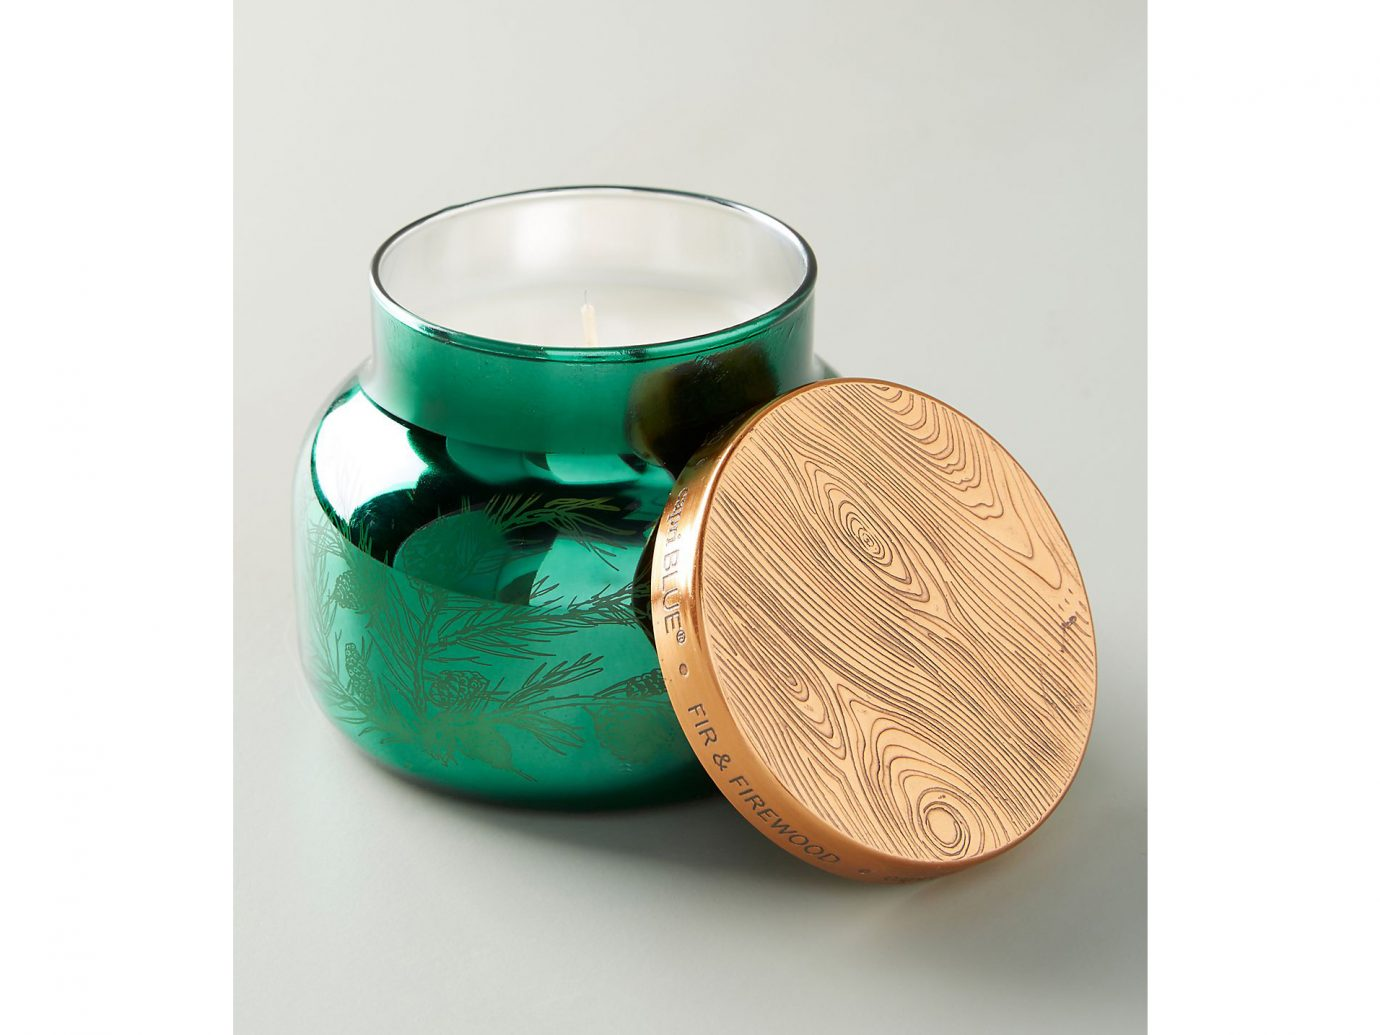 Candle: Capri Blue Fir & Firewood Jar Candle